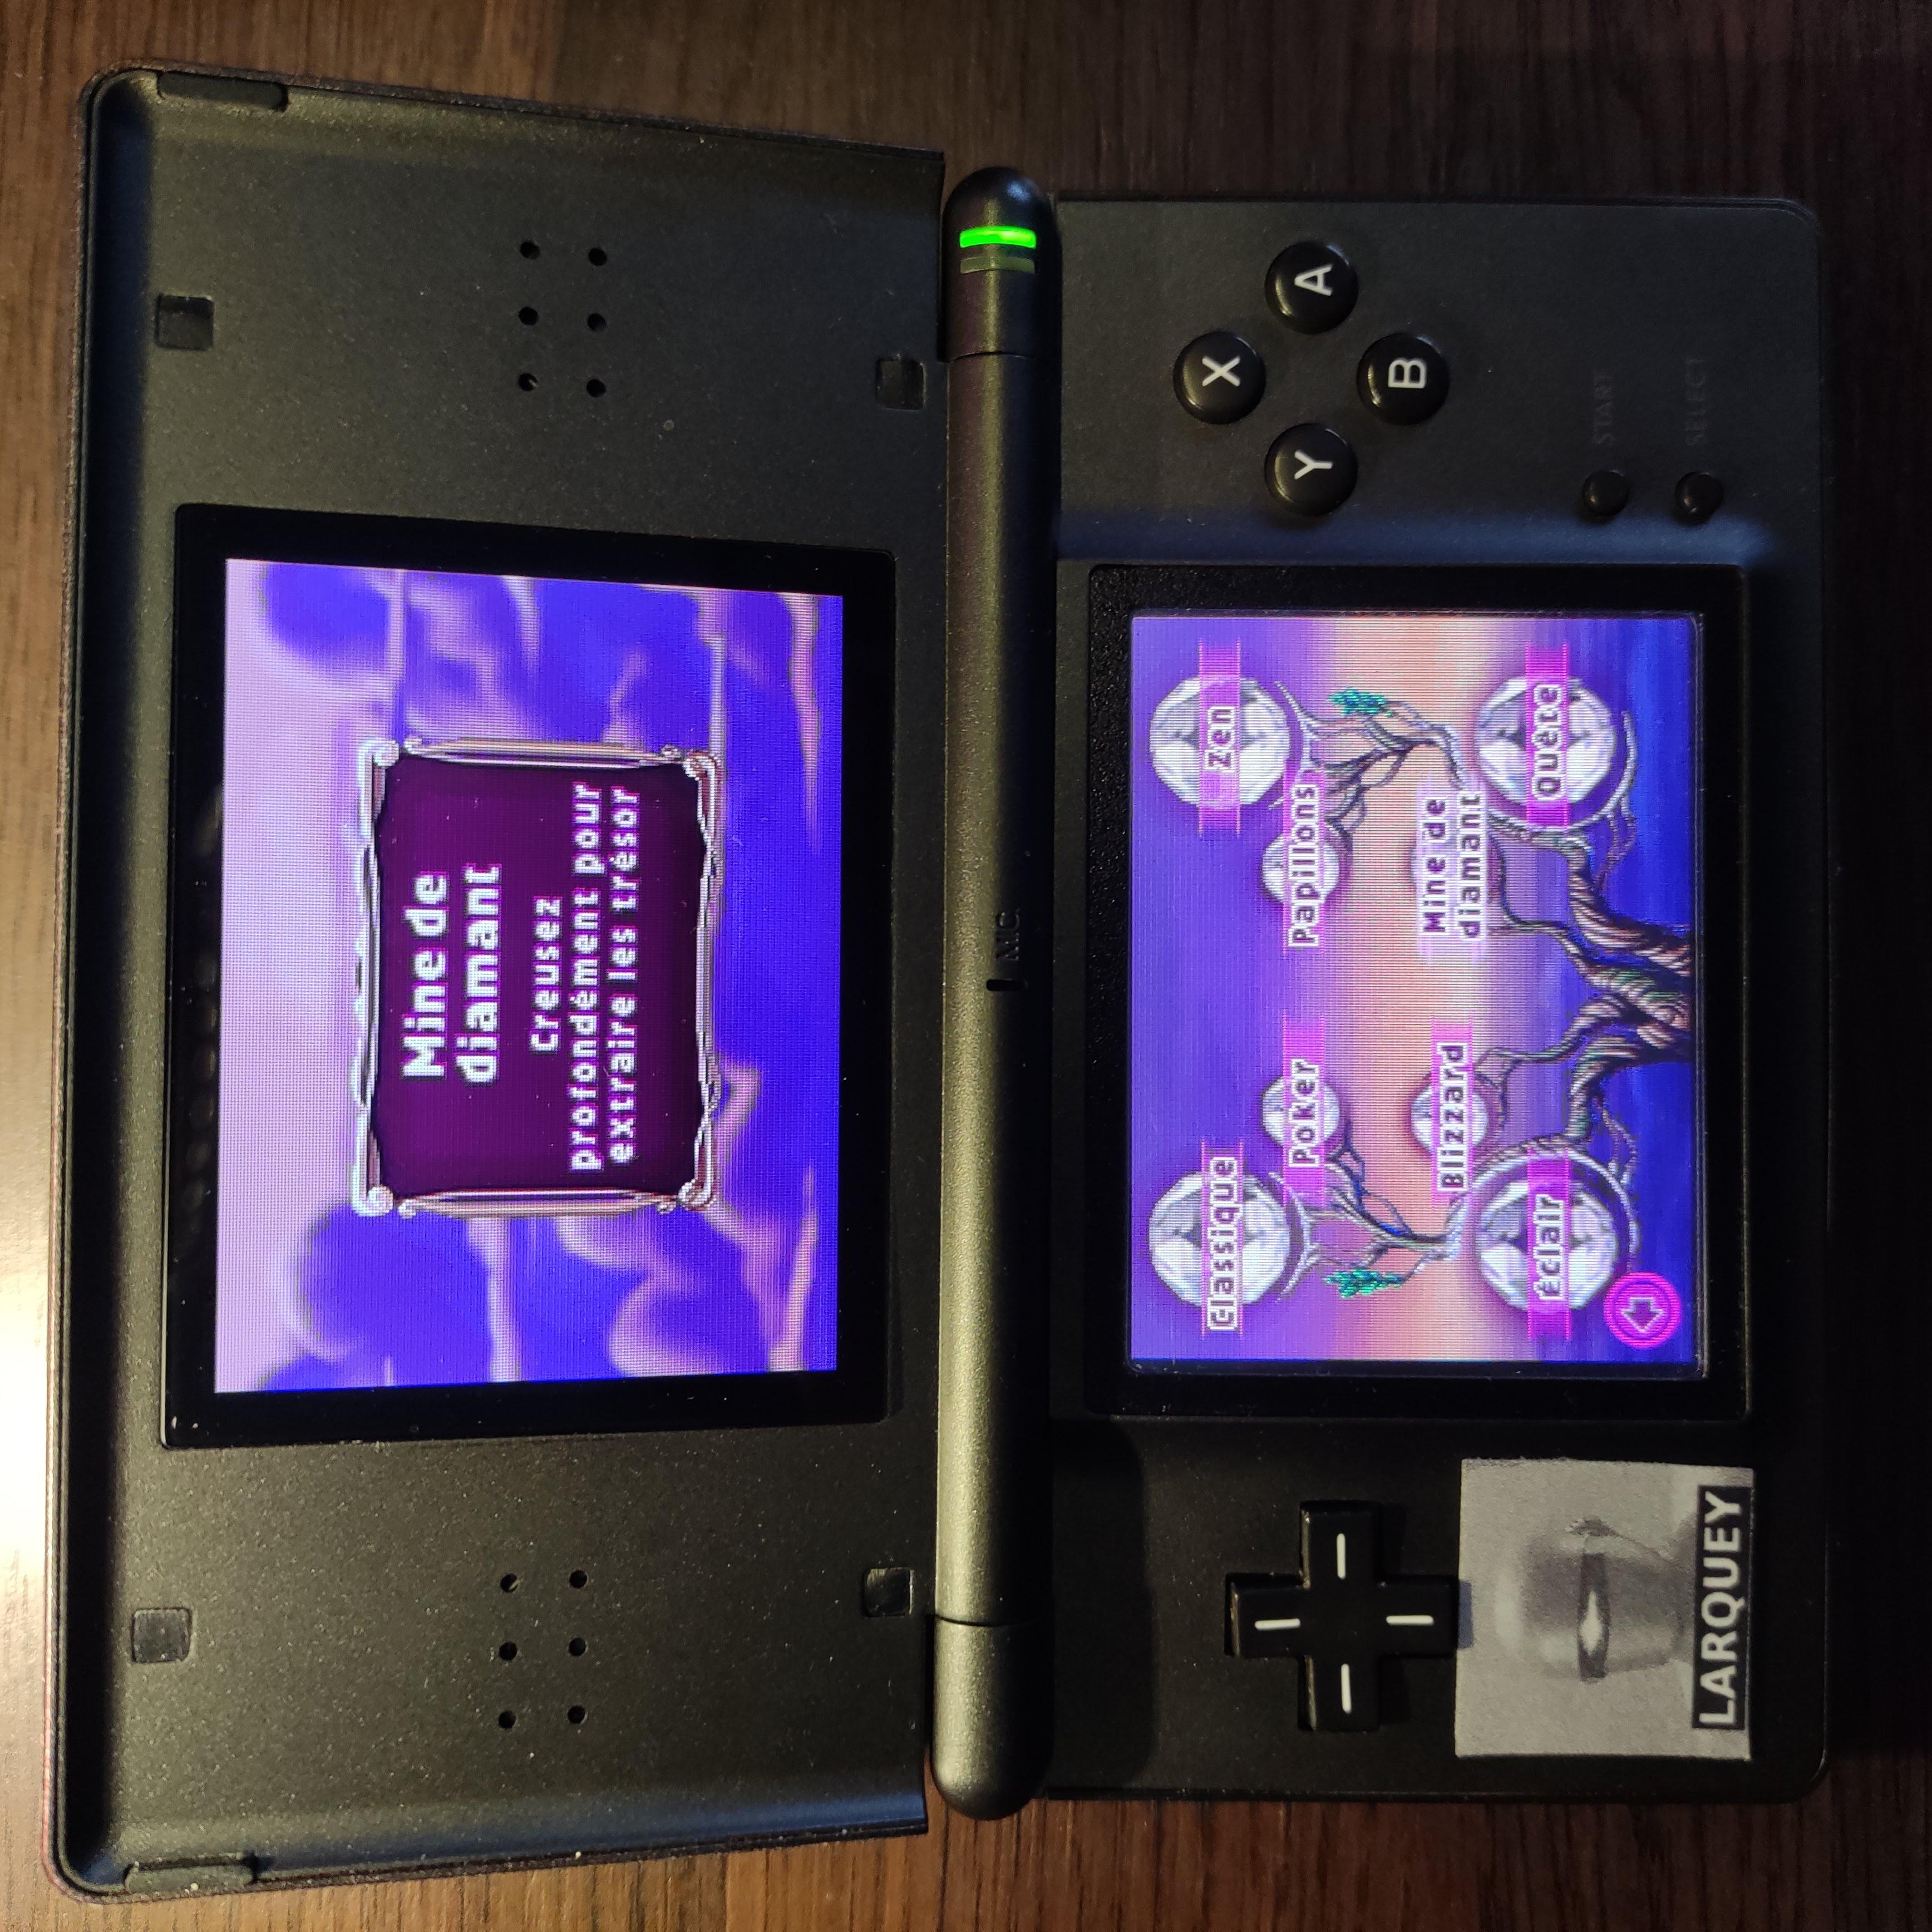 Larquey: Bejeweled 3: Diamond Mine [Total Time] (Nintendo DS) 0:03:37 points on 2020-09-27 12:44:37